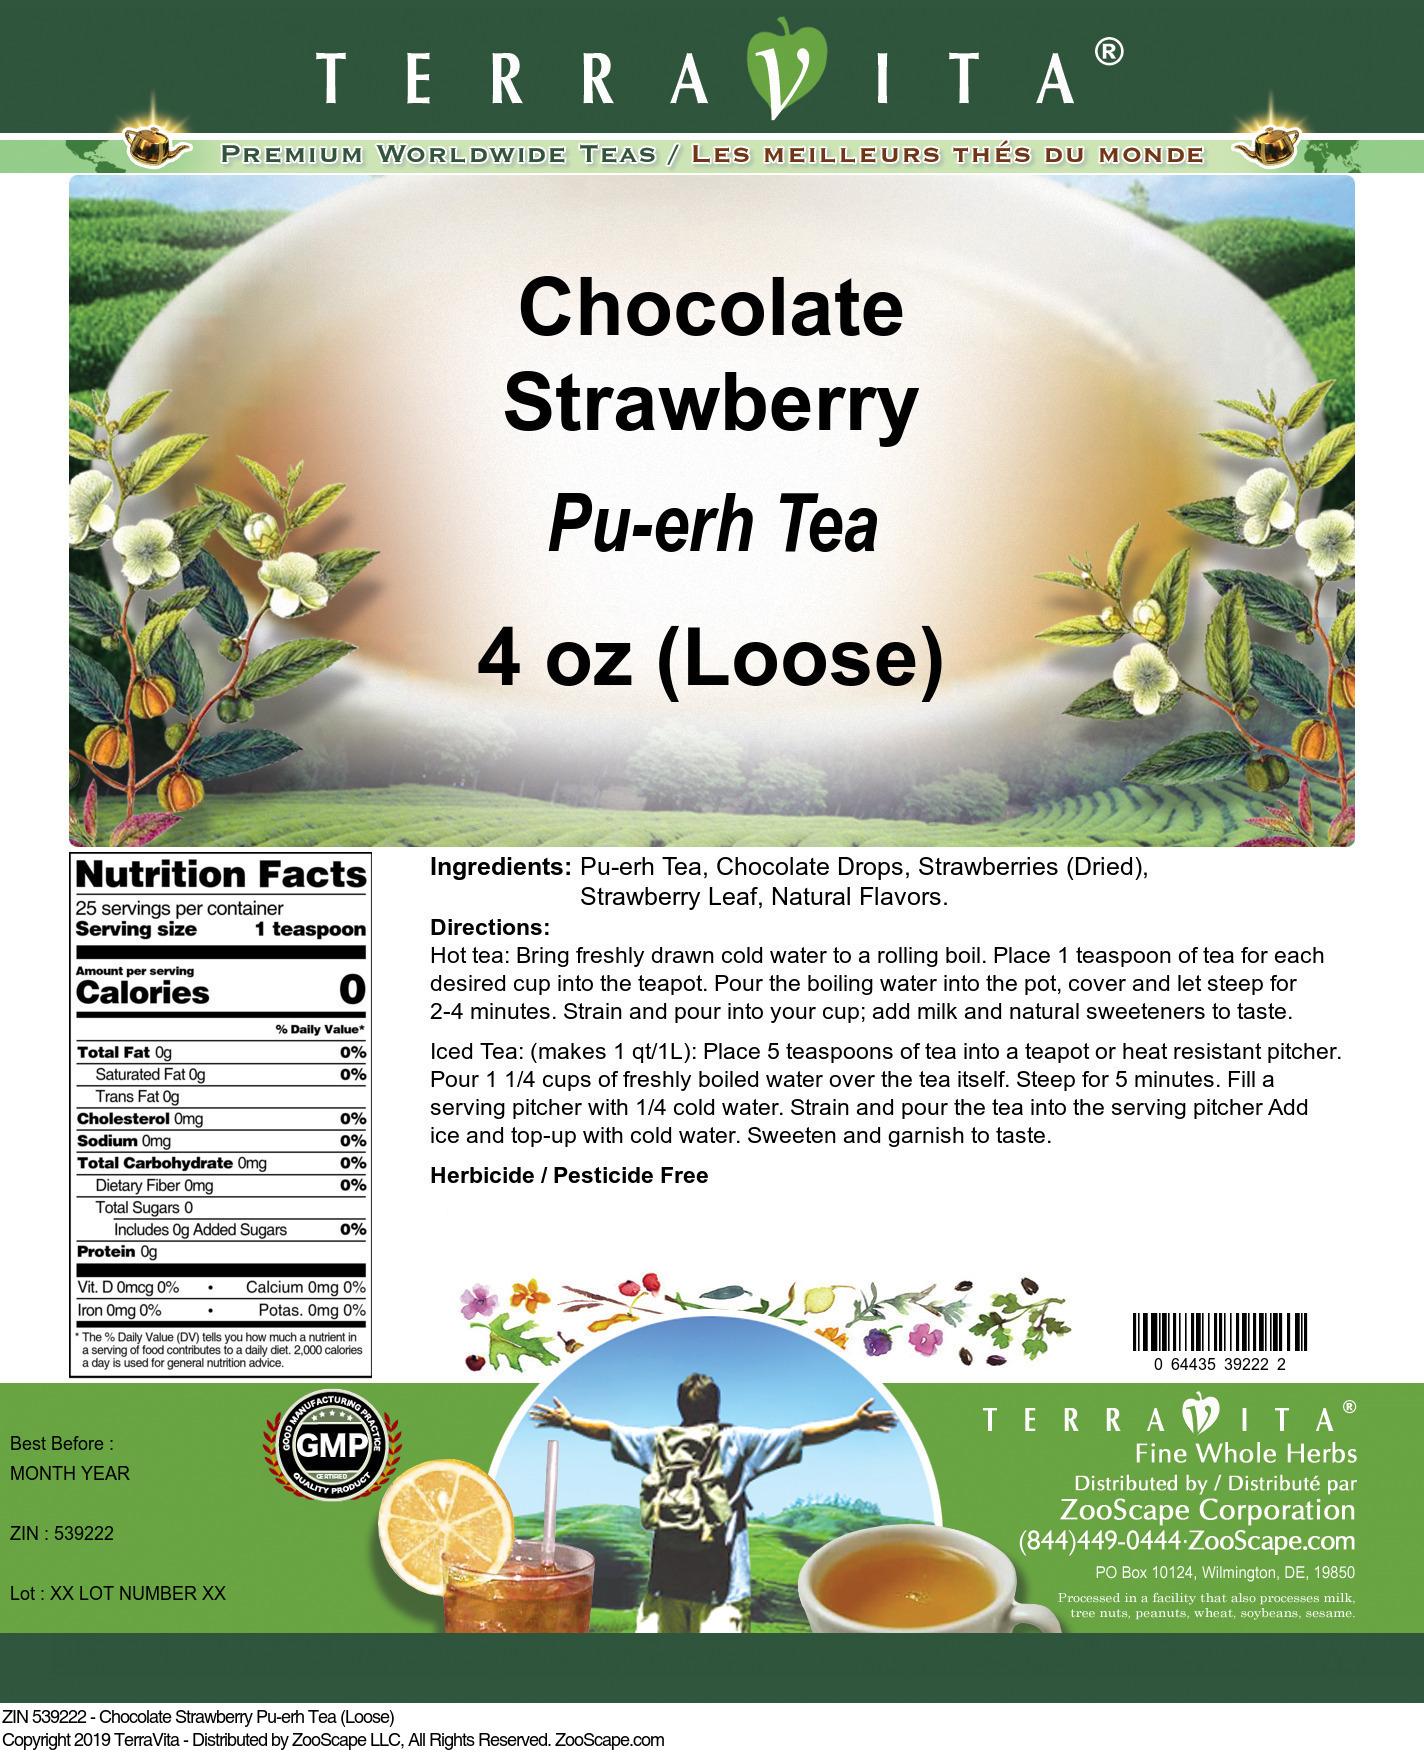 Chocolate Strawberry Pu-erh Tea